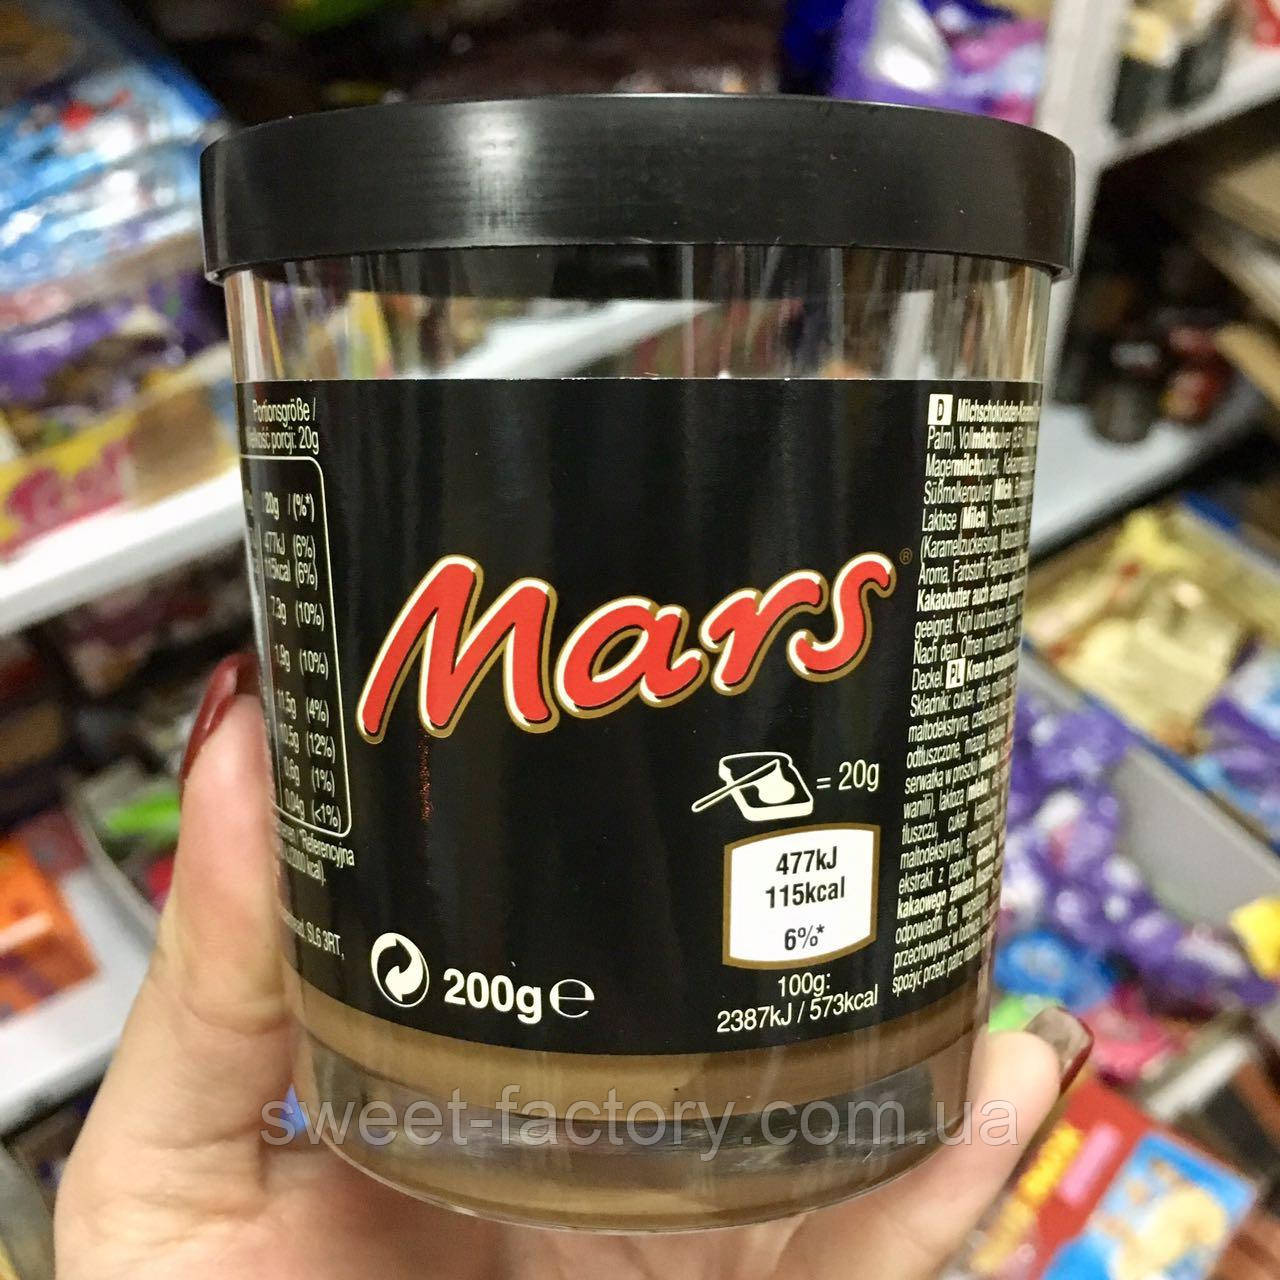 Паста Mars Creme